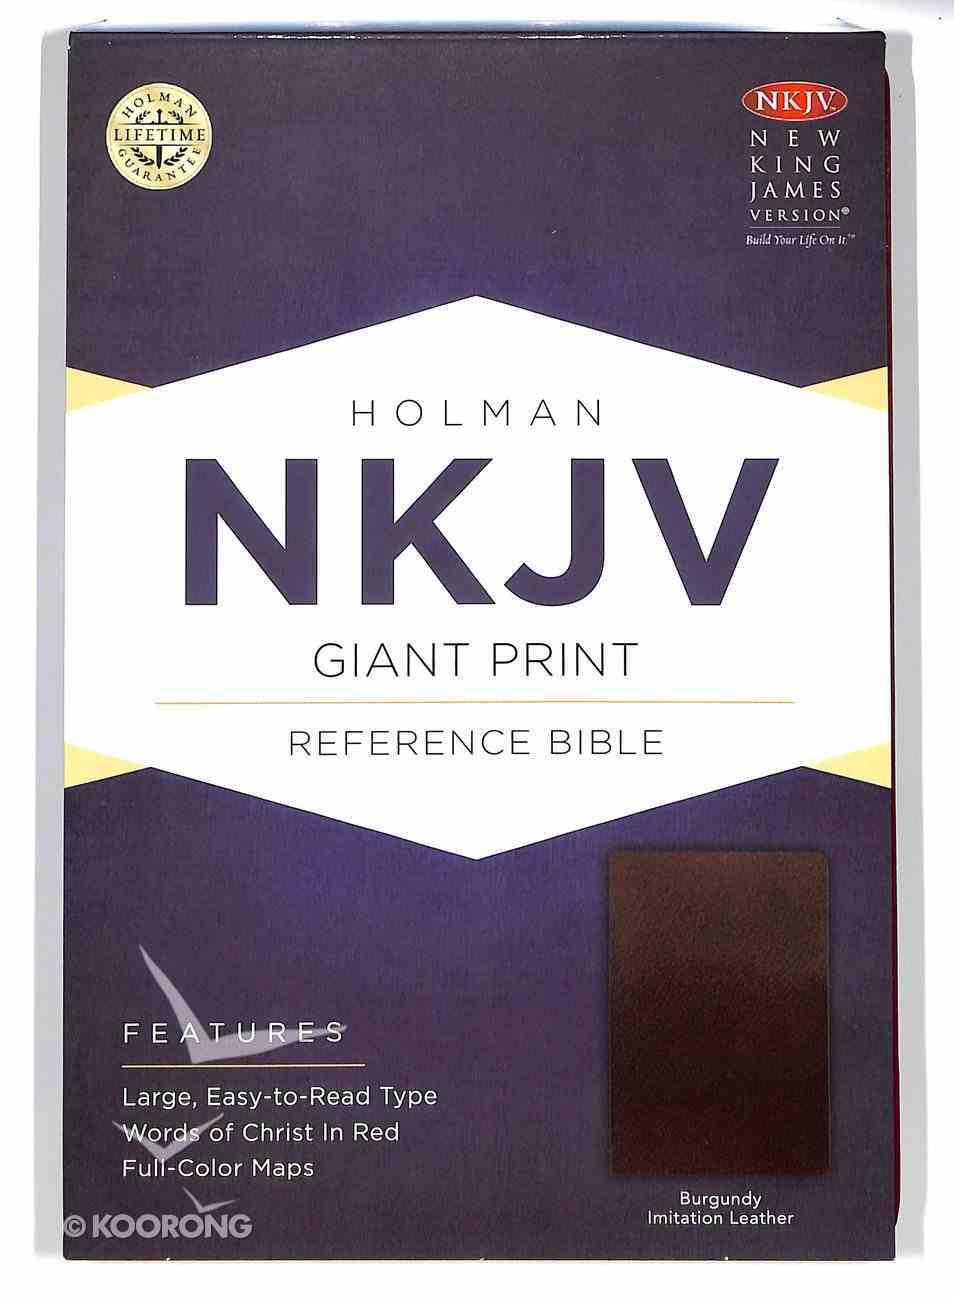 NKJV Giant Print Reference Bible Burgundy Imitation Leather